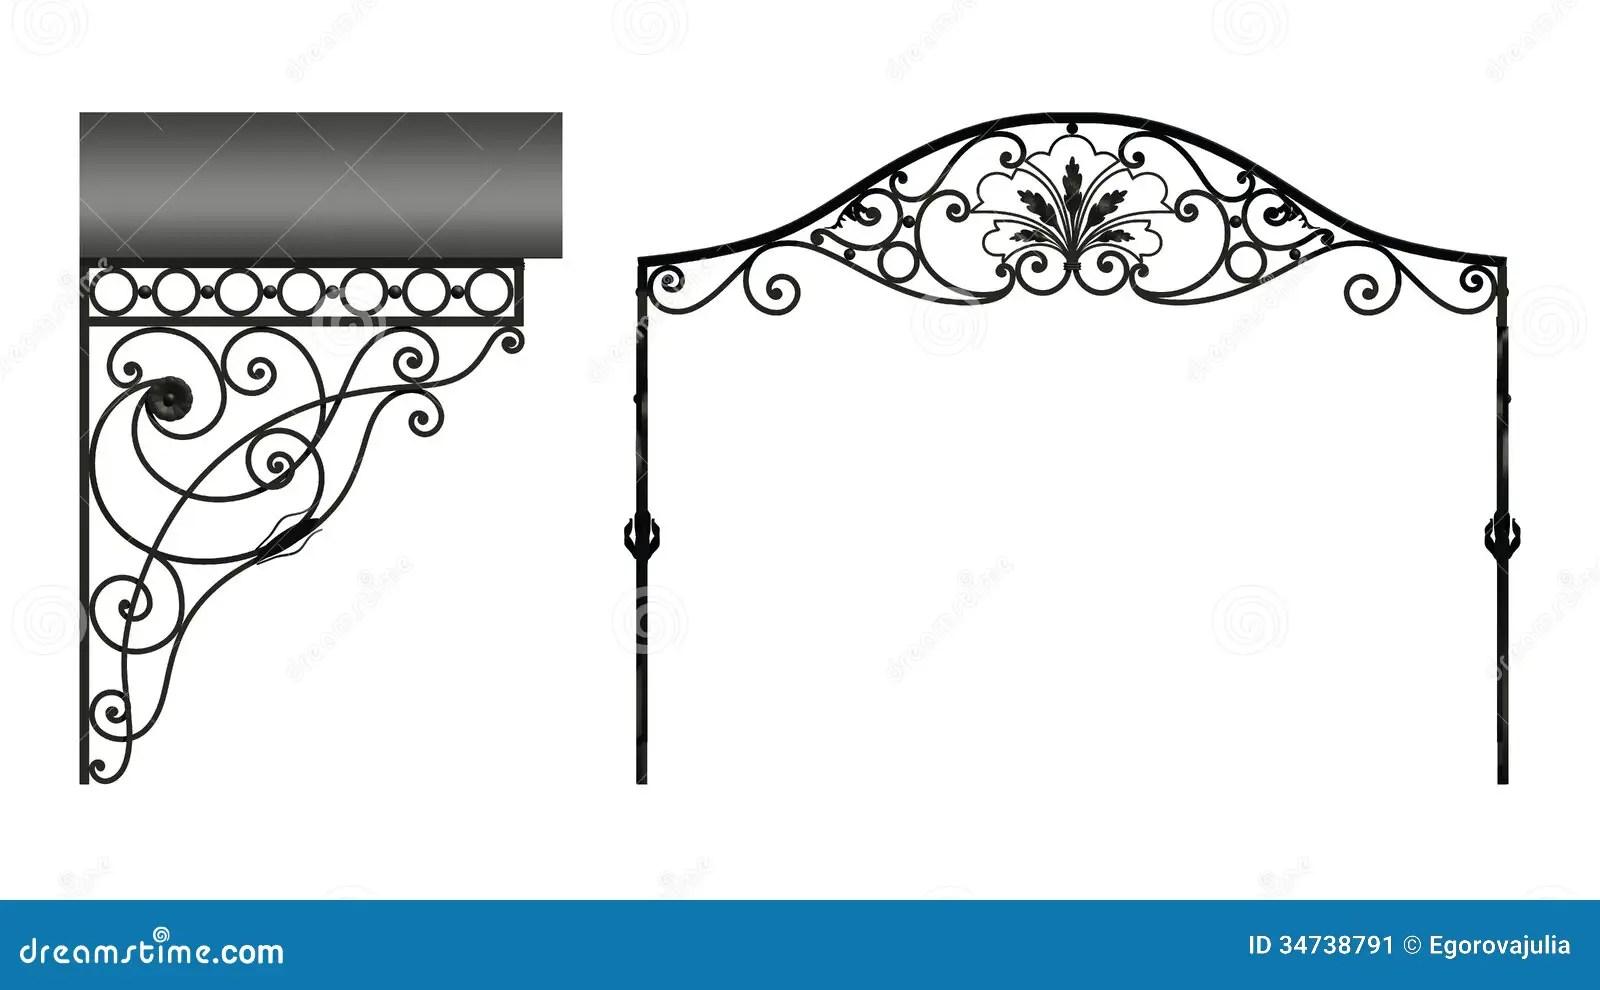 Wrought Iron Canopy Stock Image